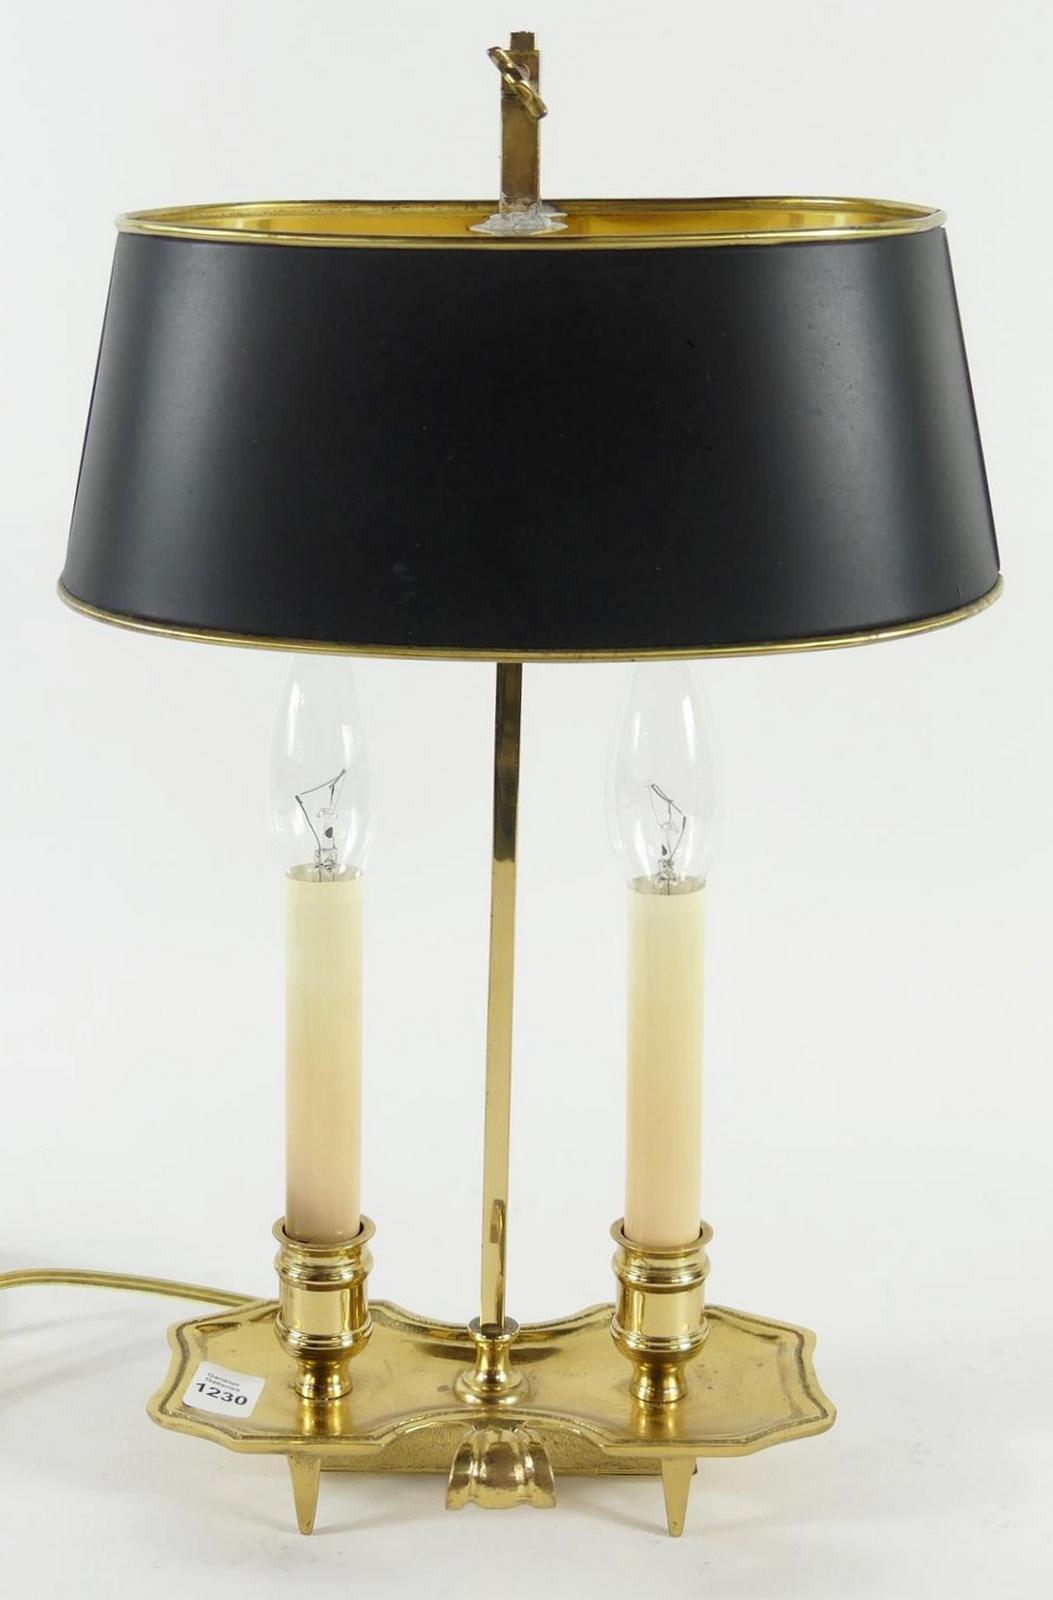 BOUILLOTTE STYLE LAMP